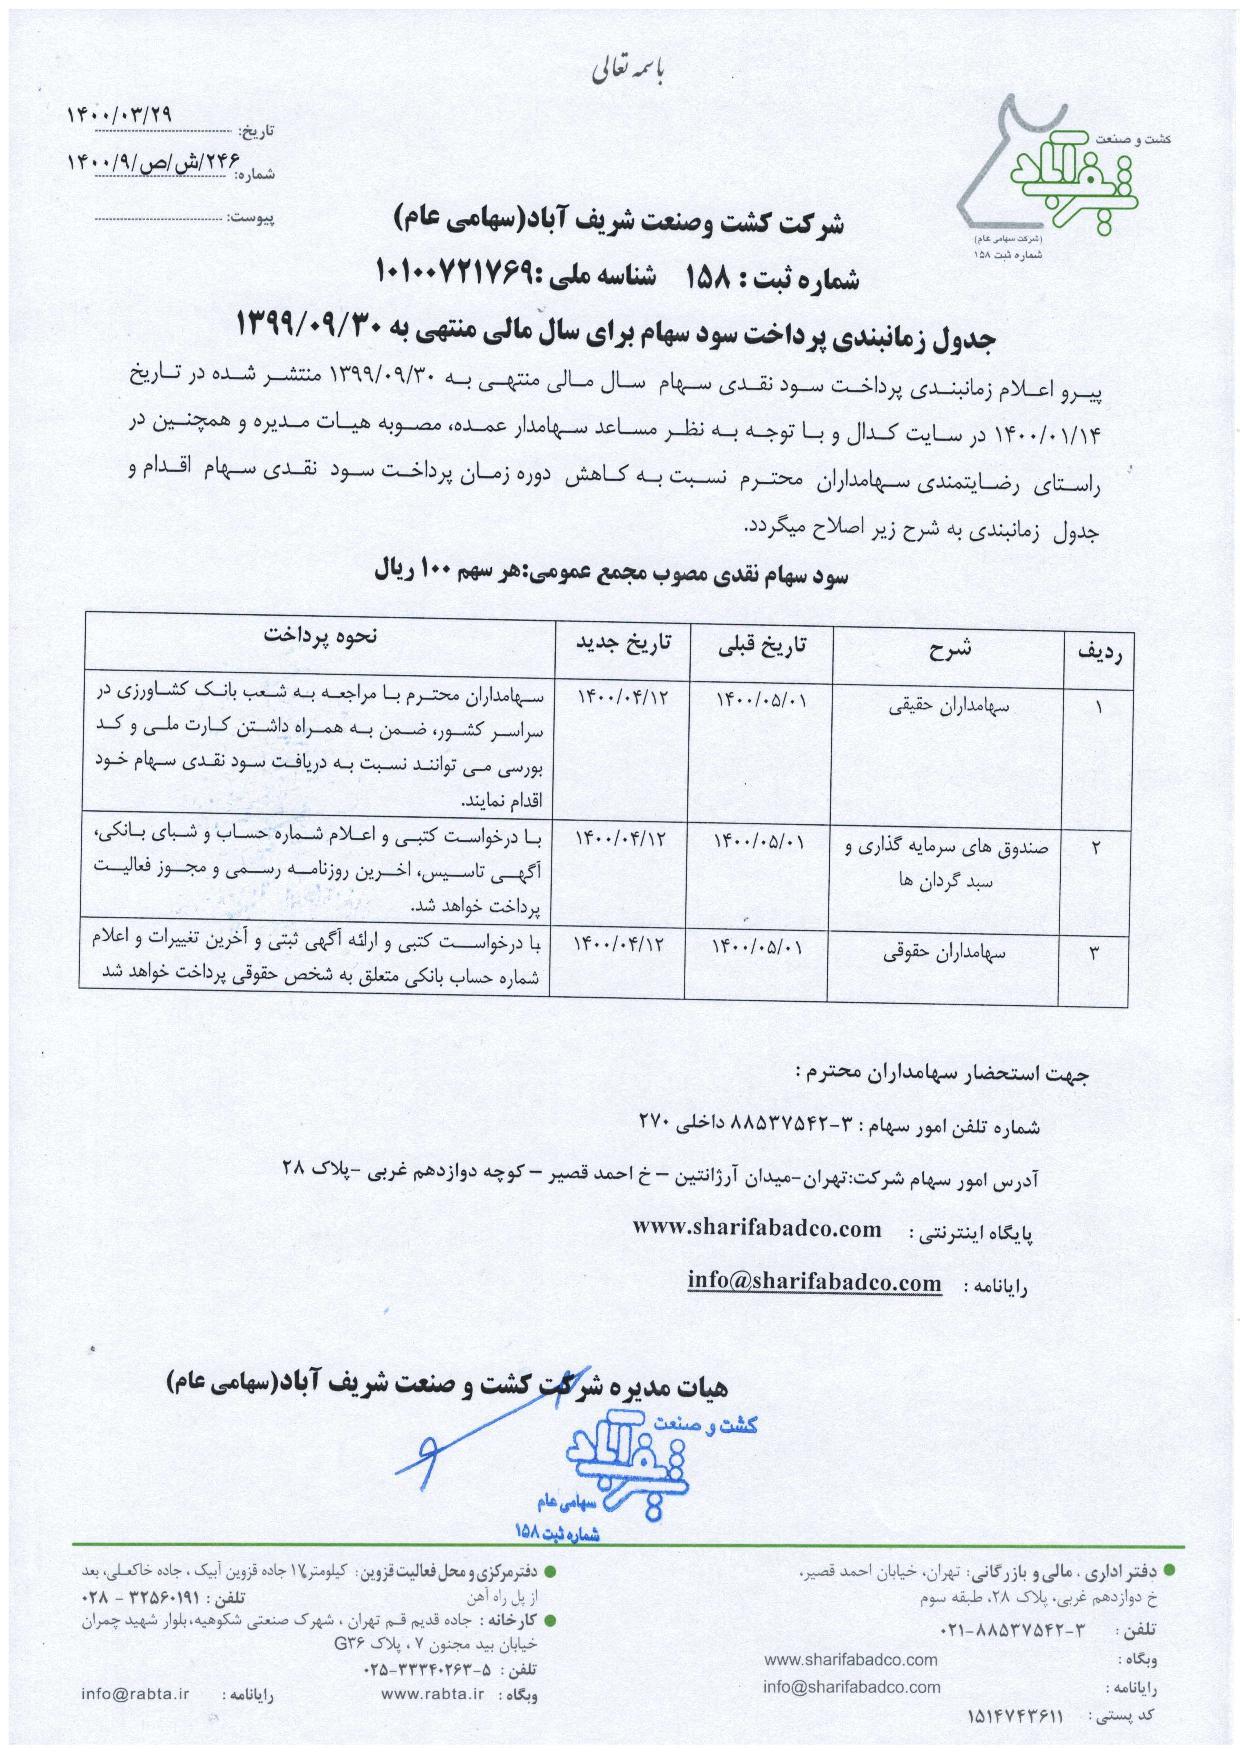 زمانبندي-پرداخت-سود-دوره-12-ماهه-منتهي-به-1399-09-30